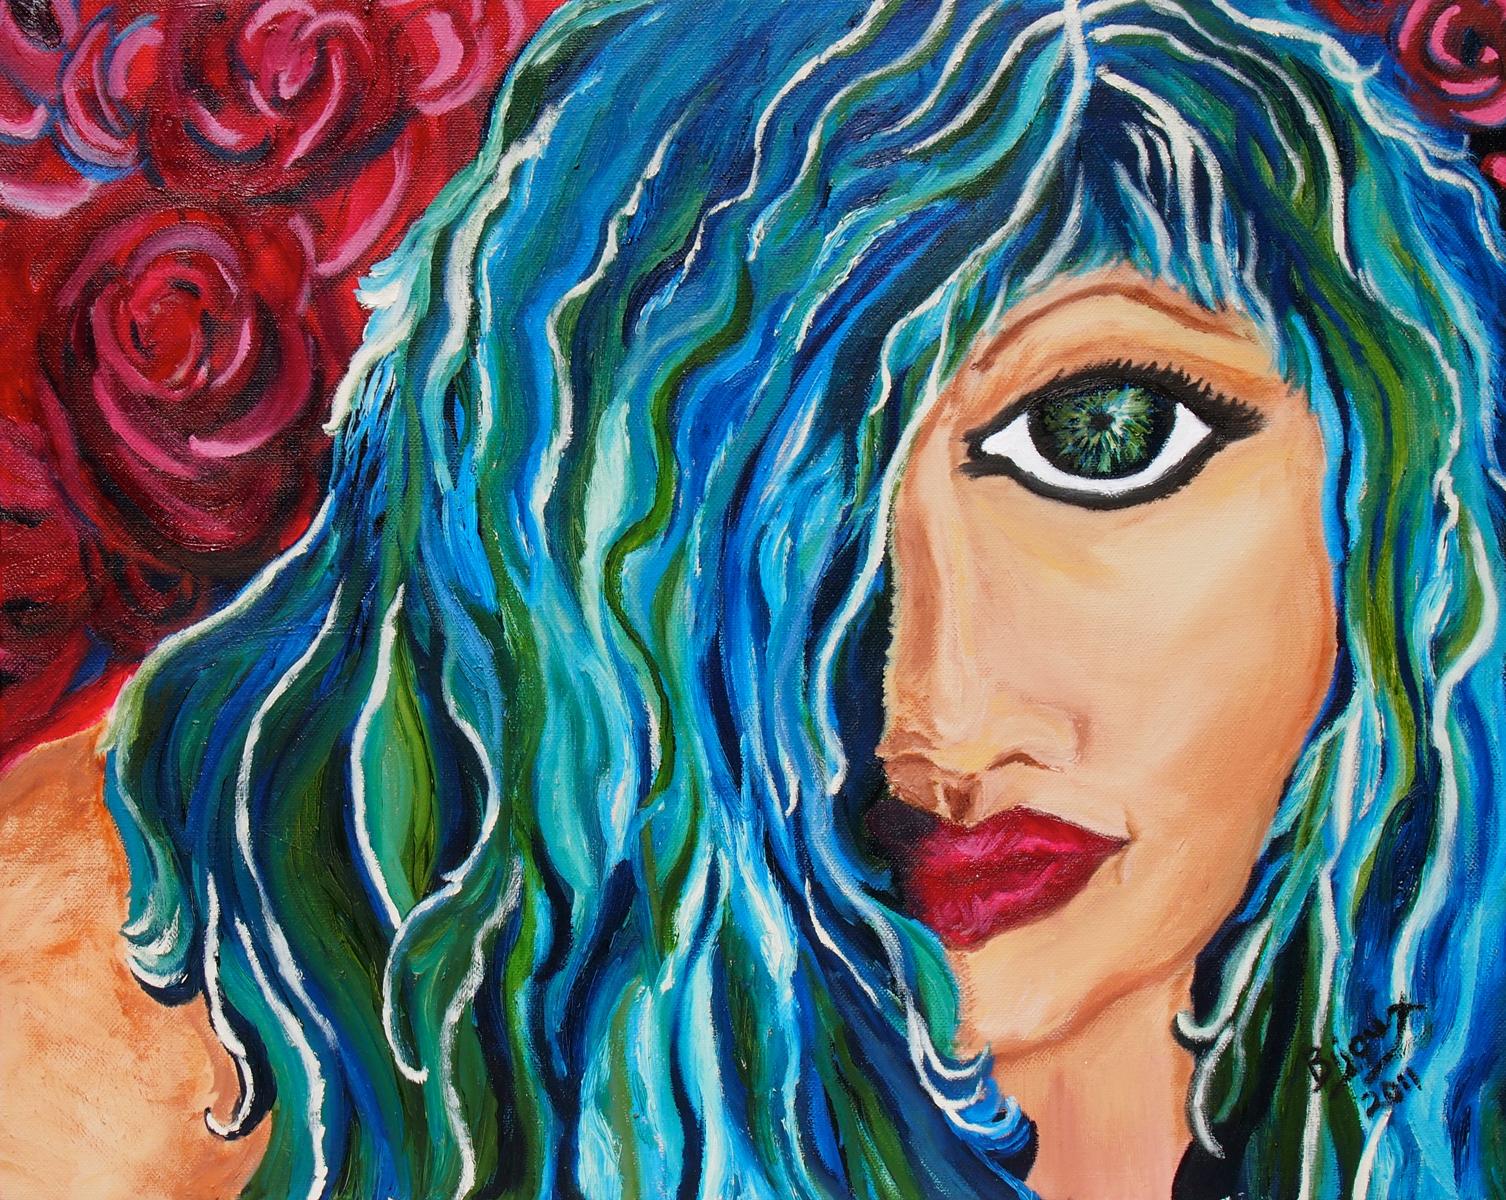 Sea Goddess Revisted